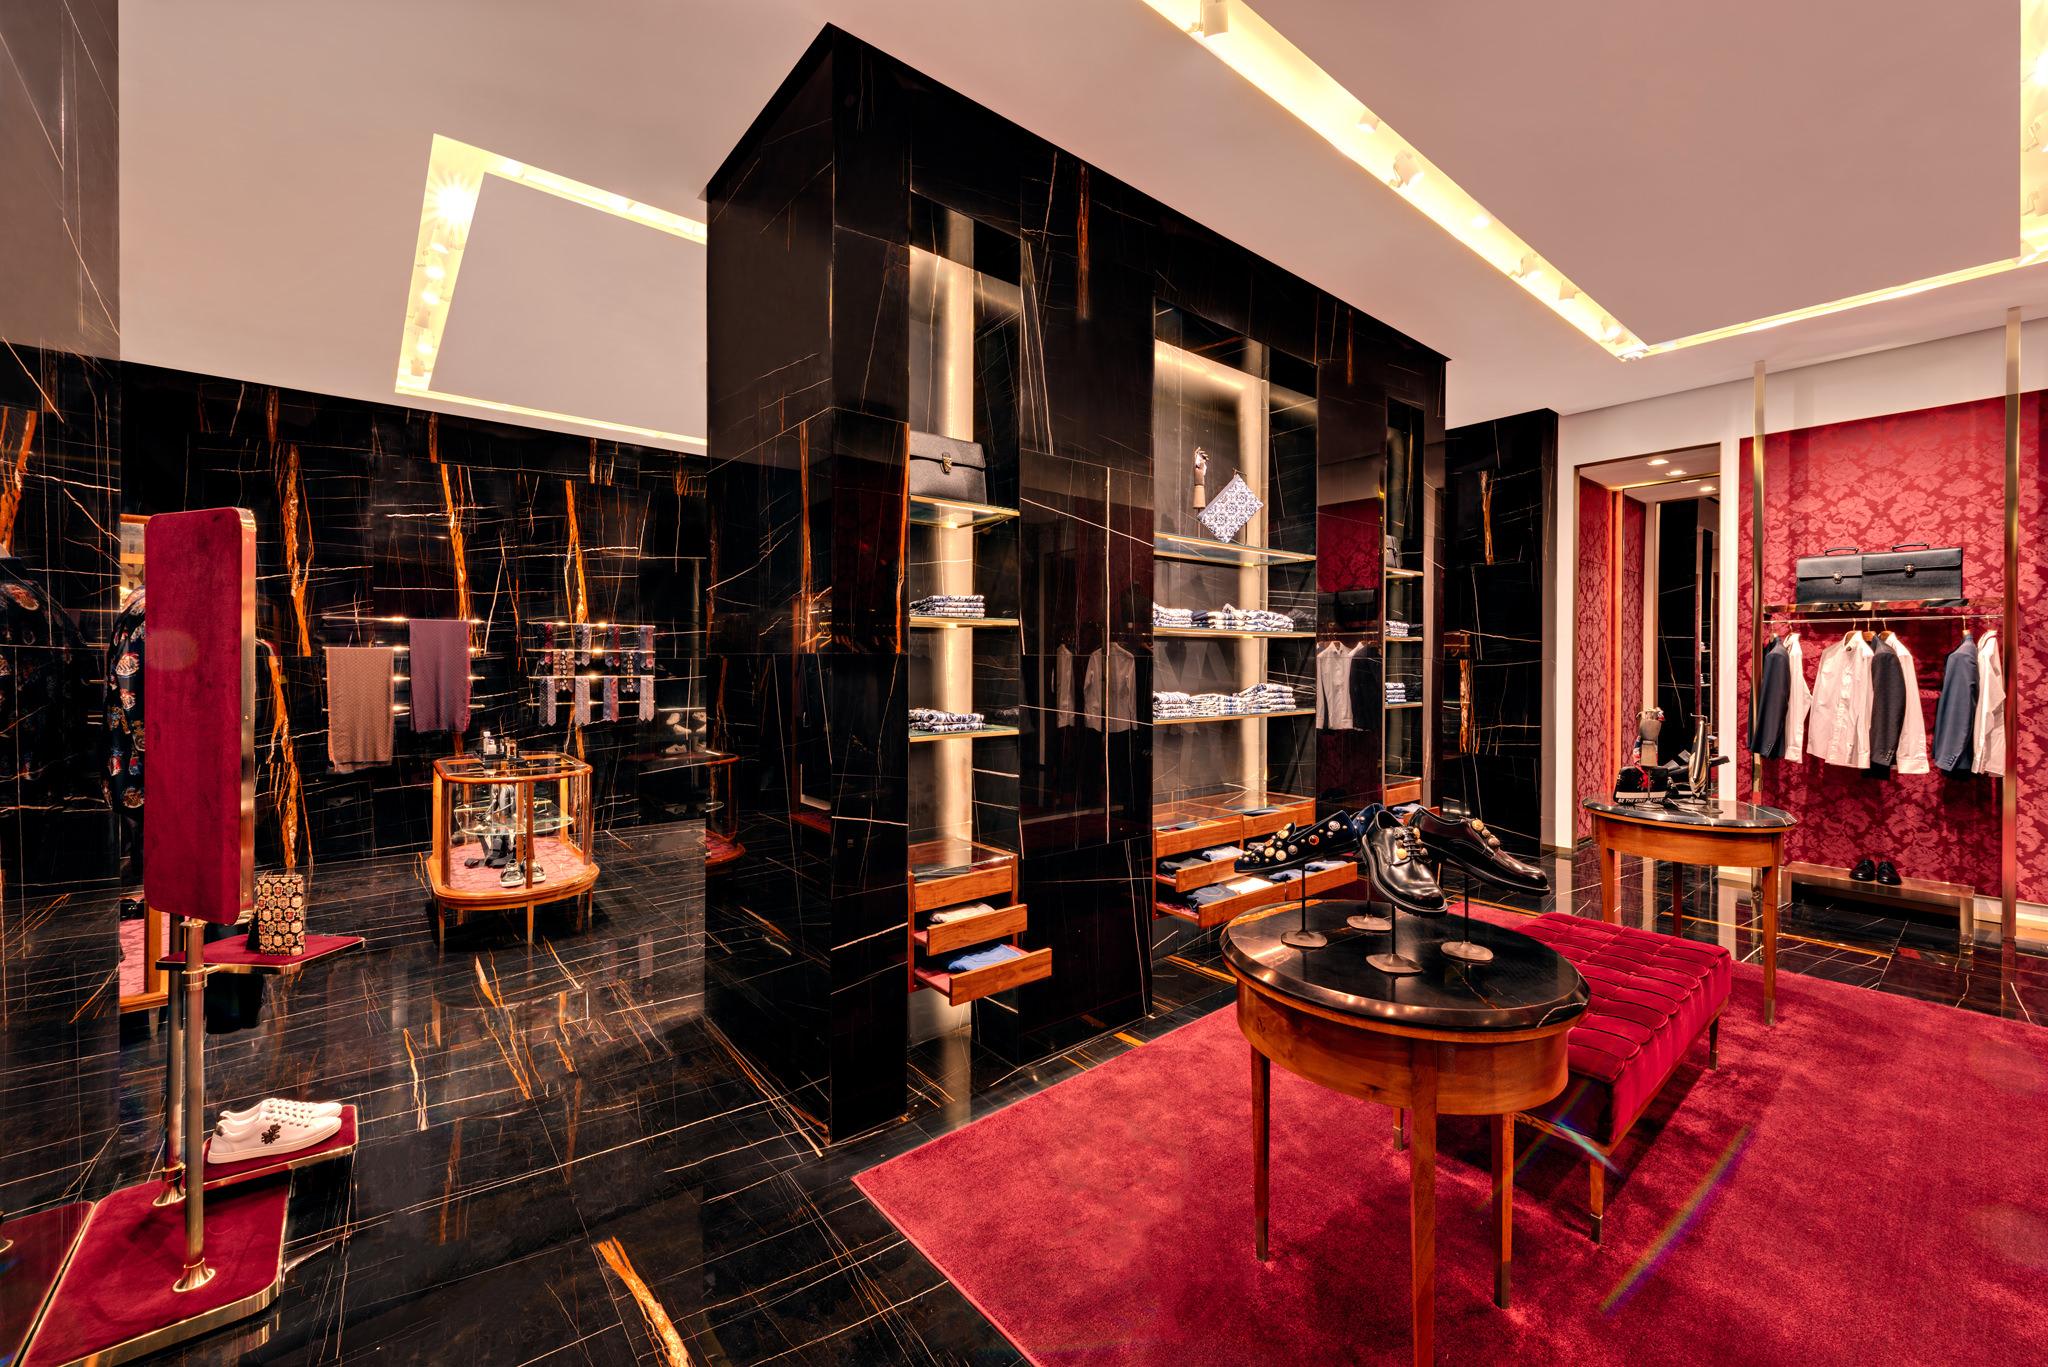 20171011 - Dolce & Gabbana - HCM - Commercial - Interior - Store - Retouch 0091.jpg